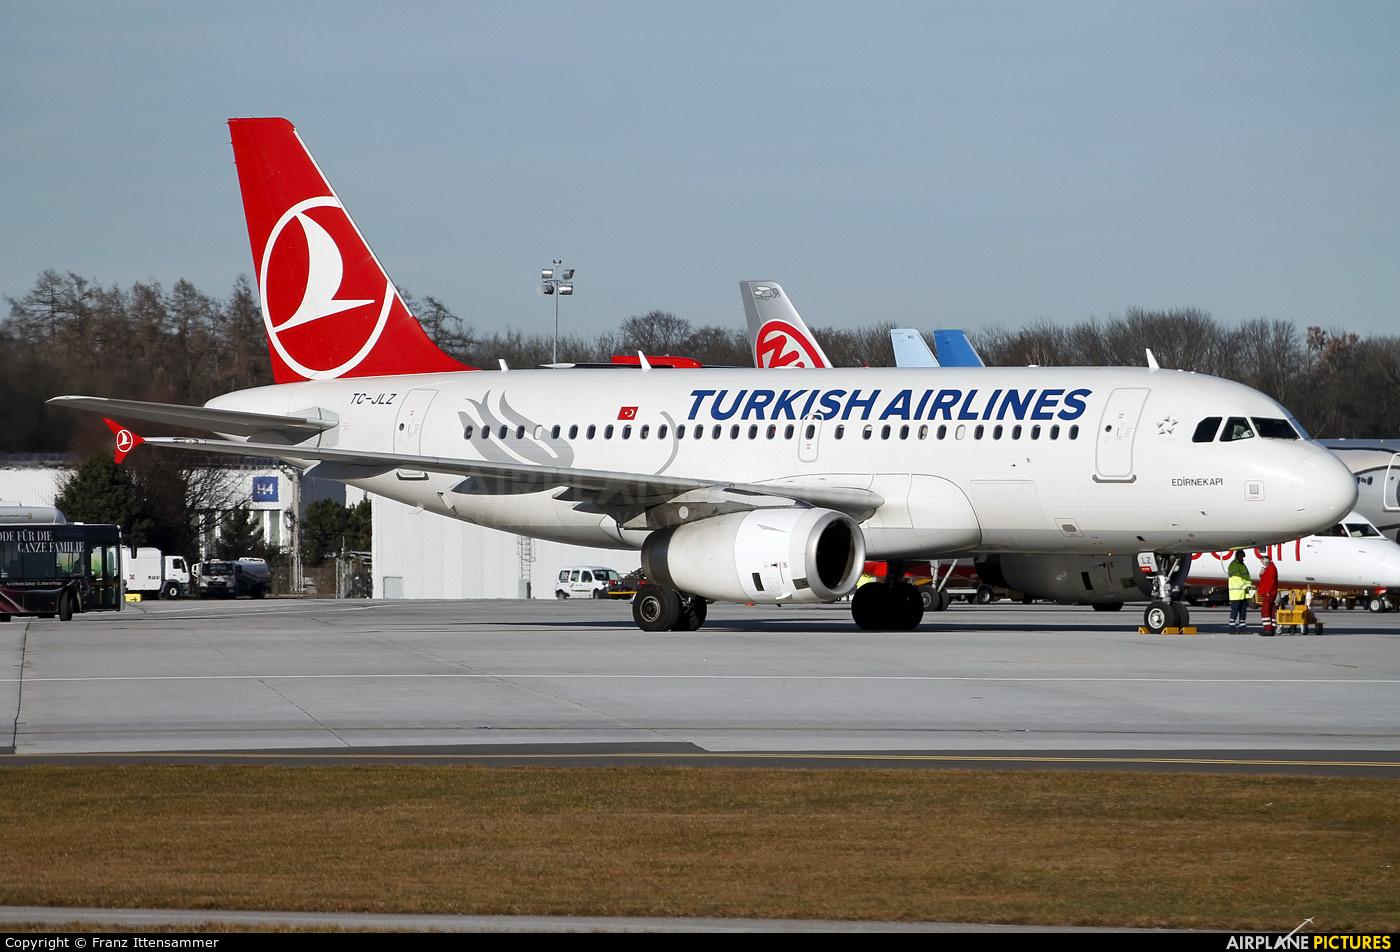 Turkish Airlines TC-JLZ aircraft at Salzburg